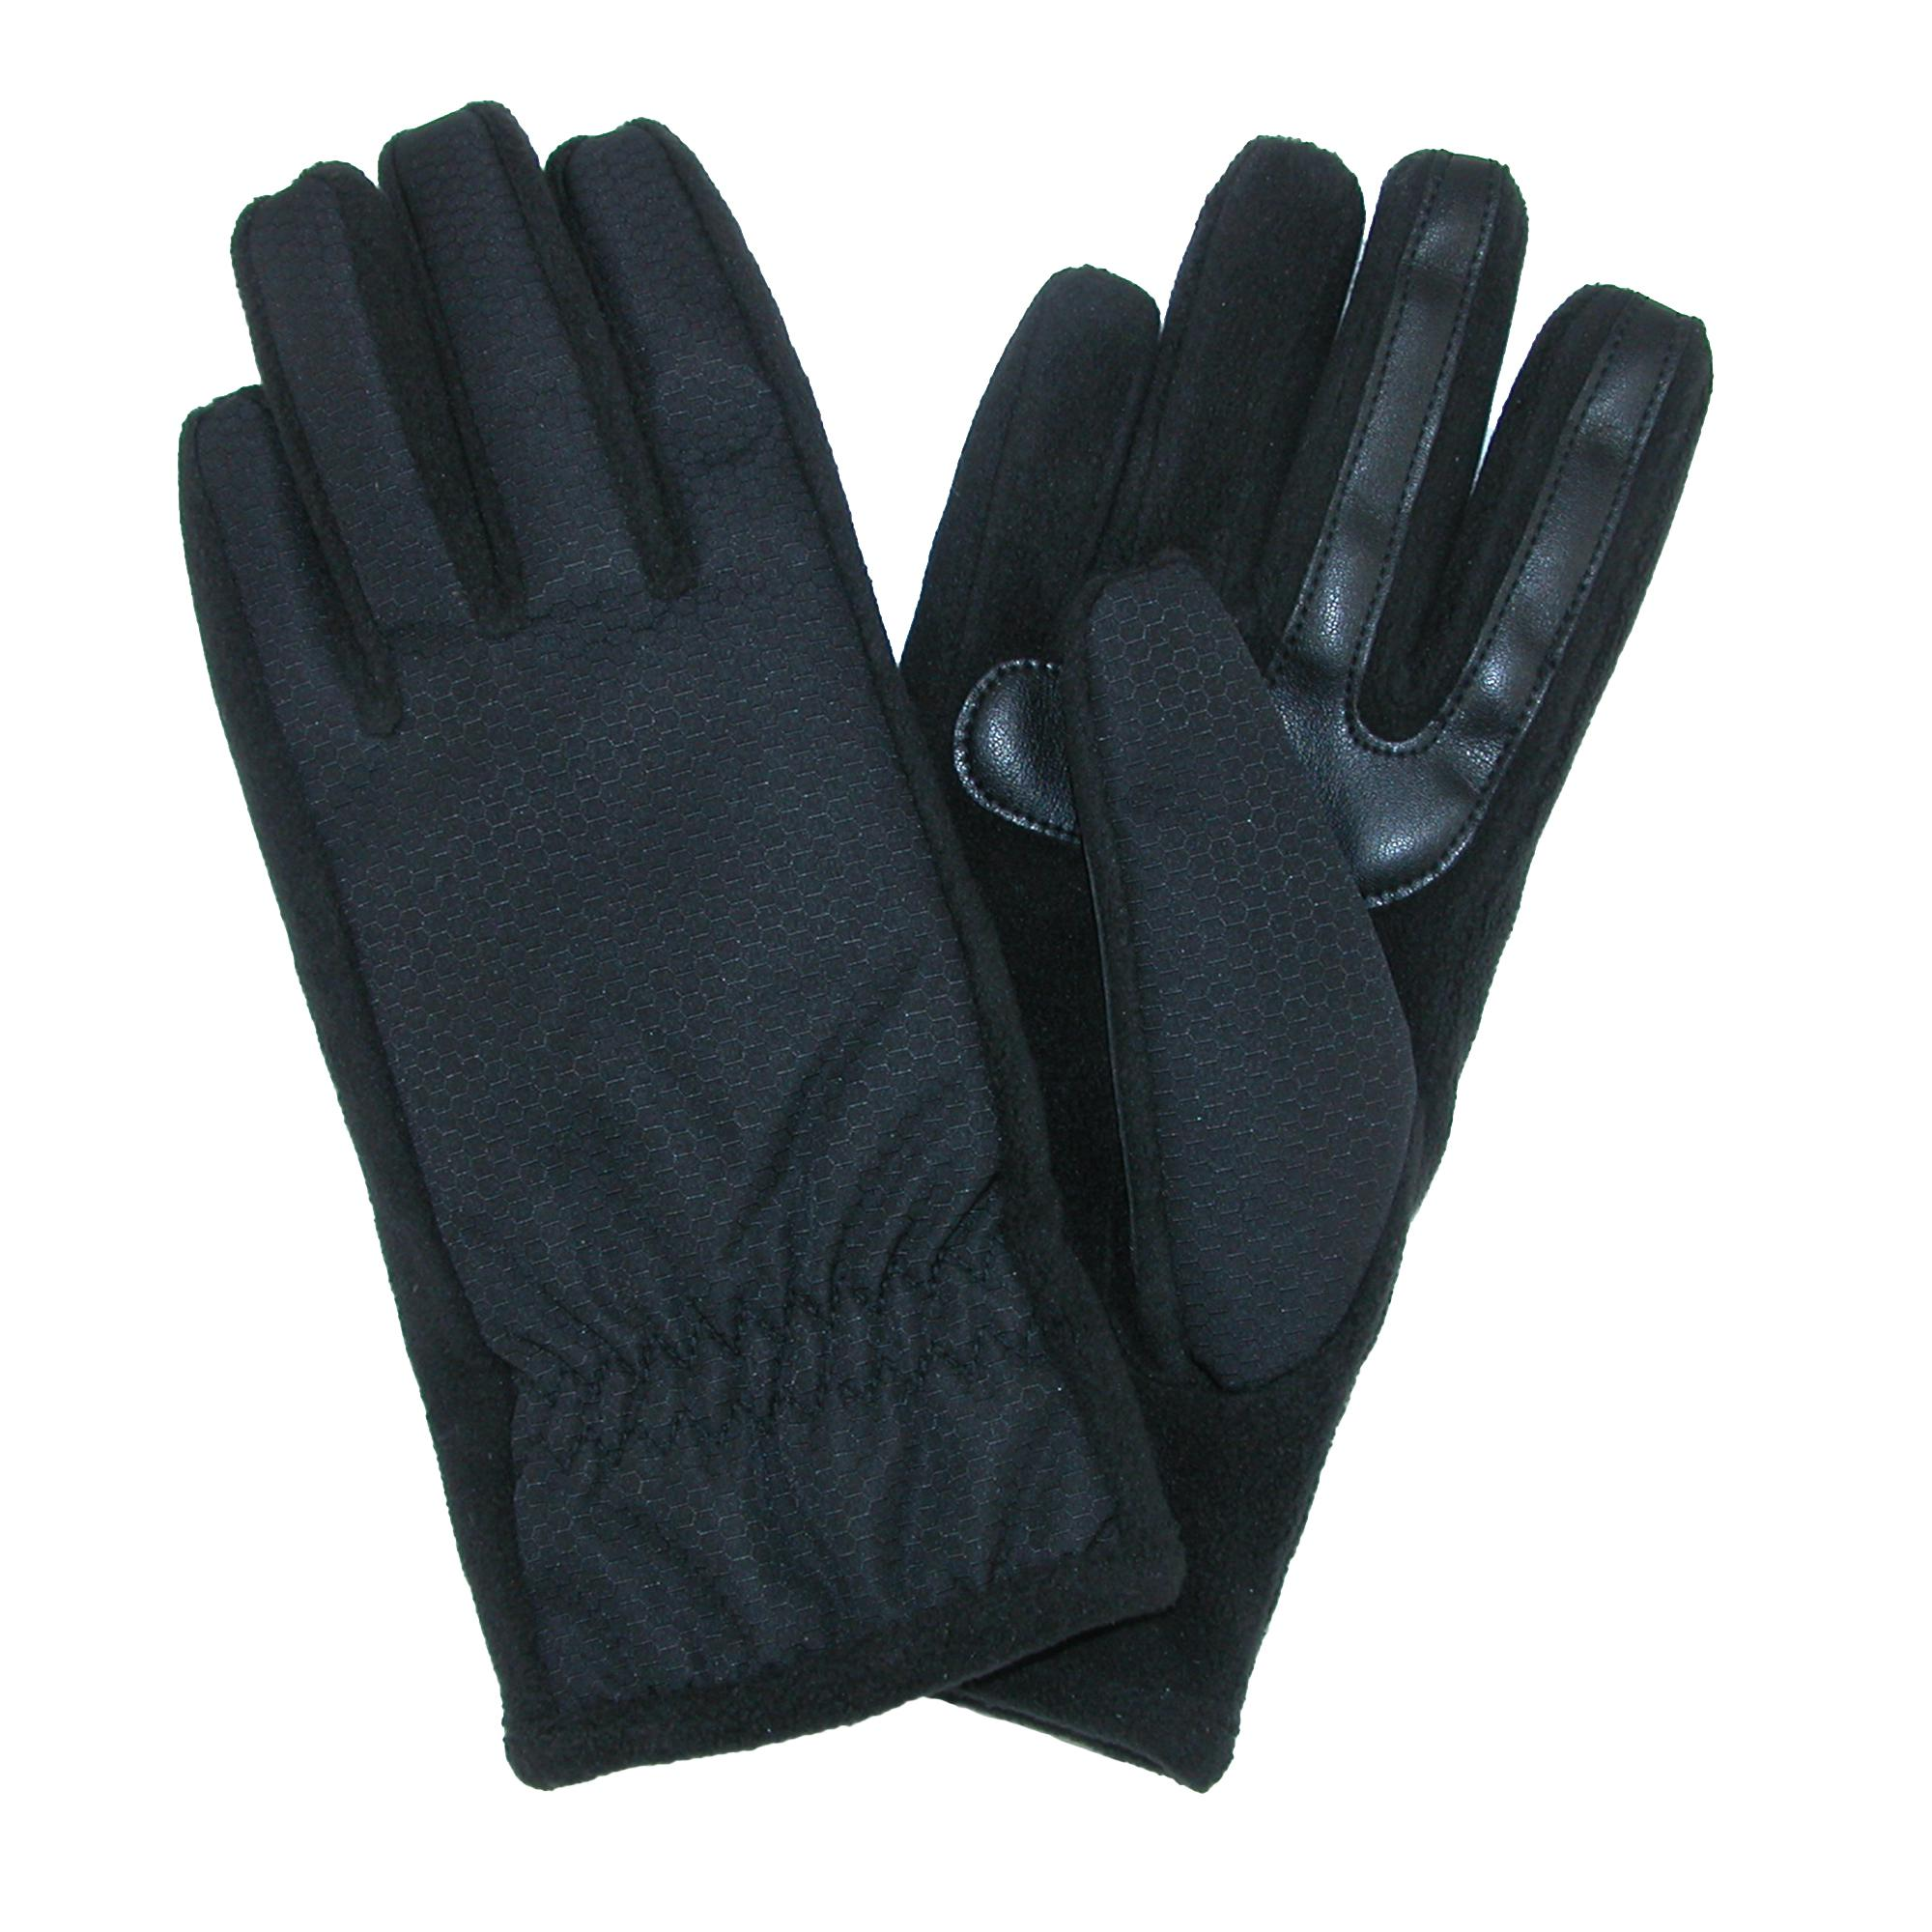 New Isotoner Women's Nylon SmarTouch Winter Texting Gloves